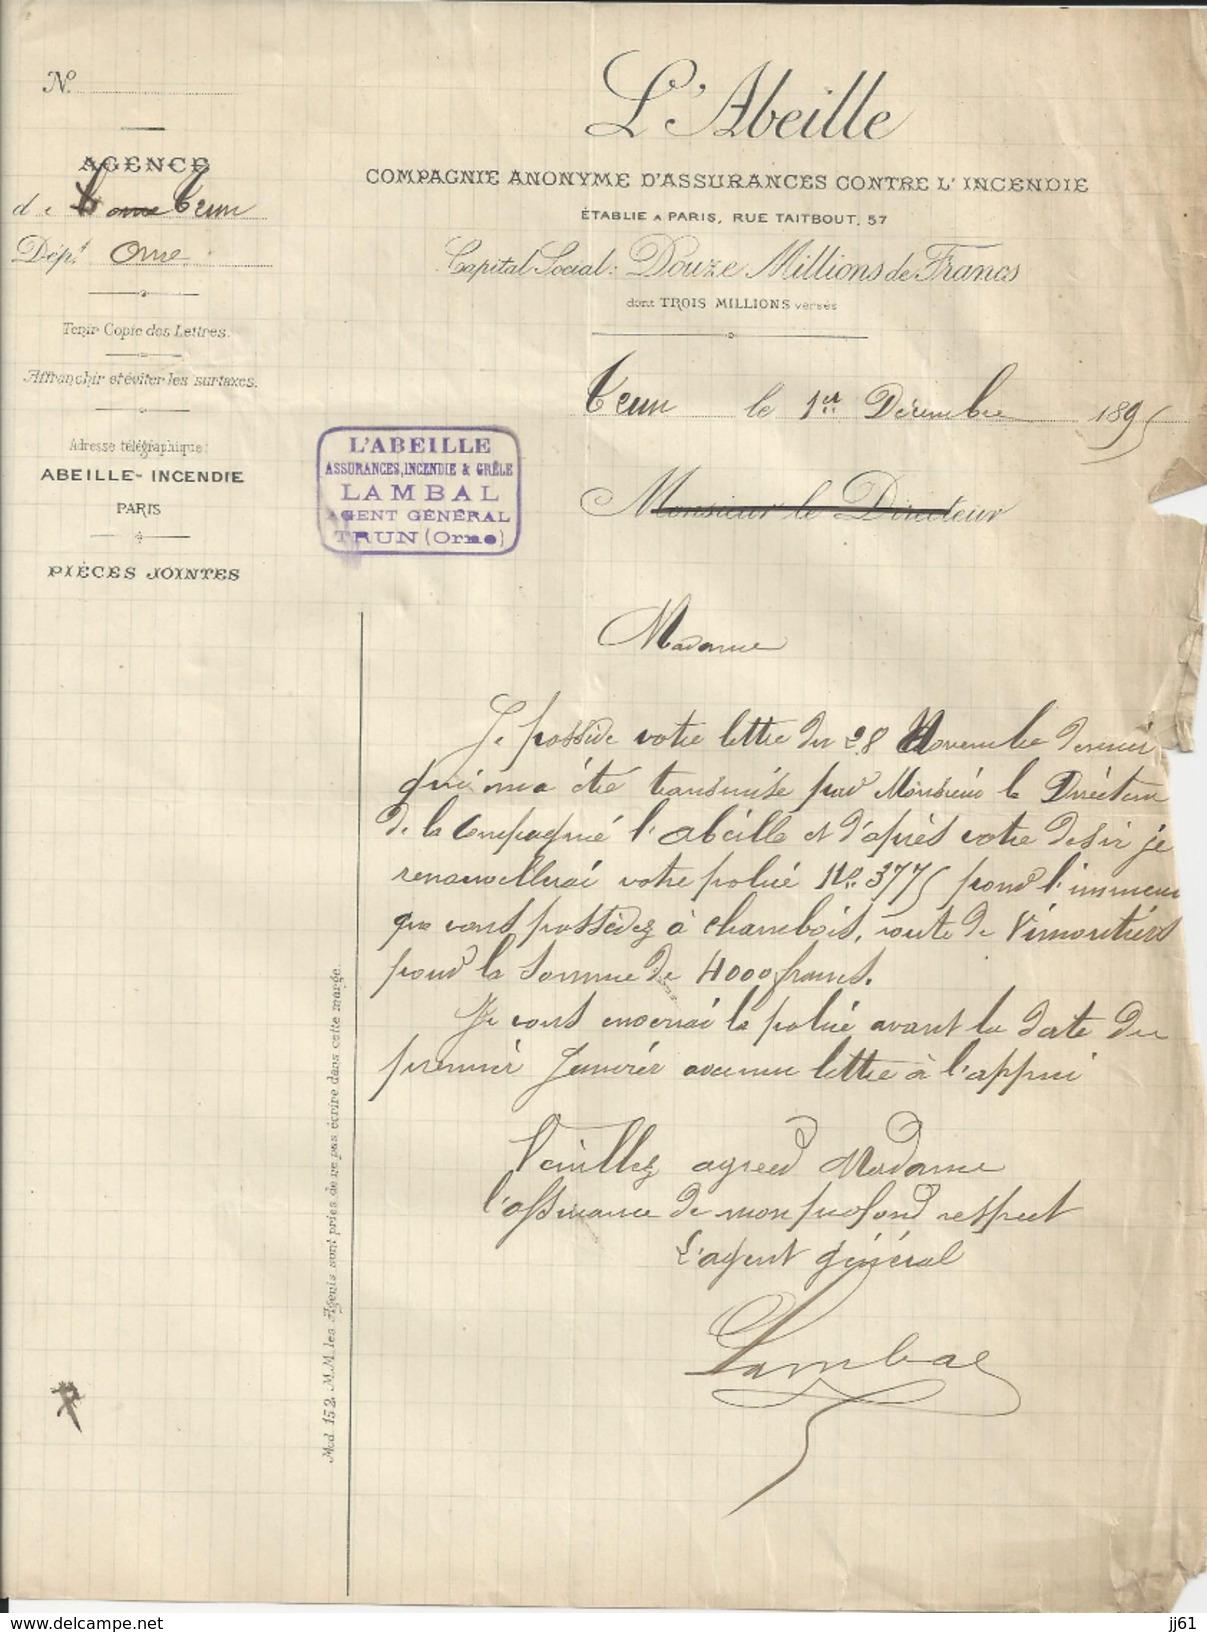 TRUN ORNE MR LAMBAL  AGENT D ASSURANCE L ABEILLE ANNEE 1895 - Royaume-Uni